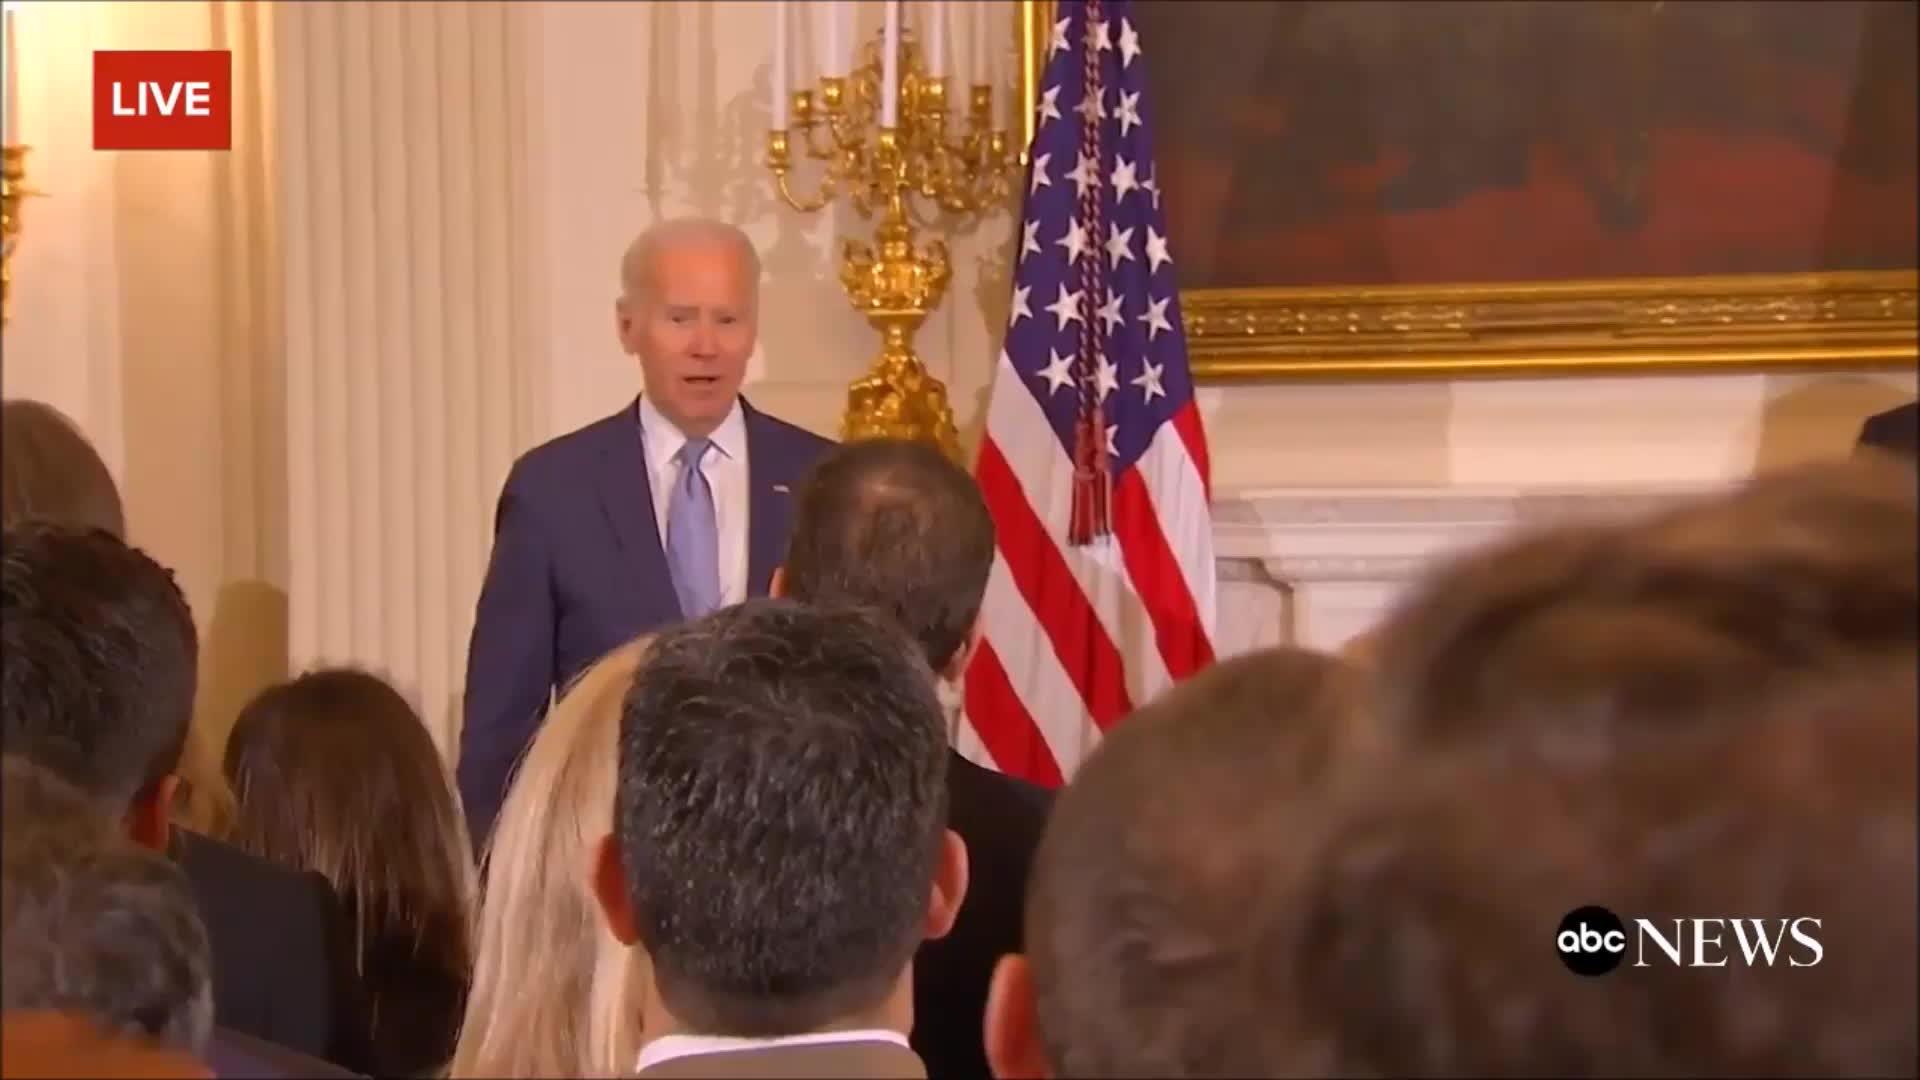 barack obama, joe biden, joebiden, unclejoe, vicepresident, Joe Biden 2017 GIFs